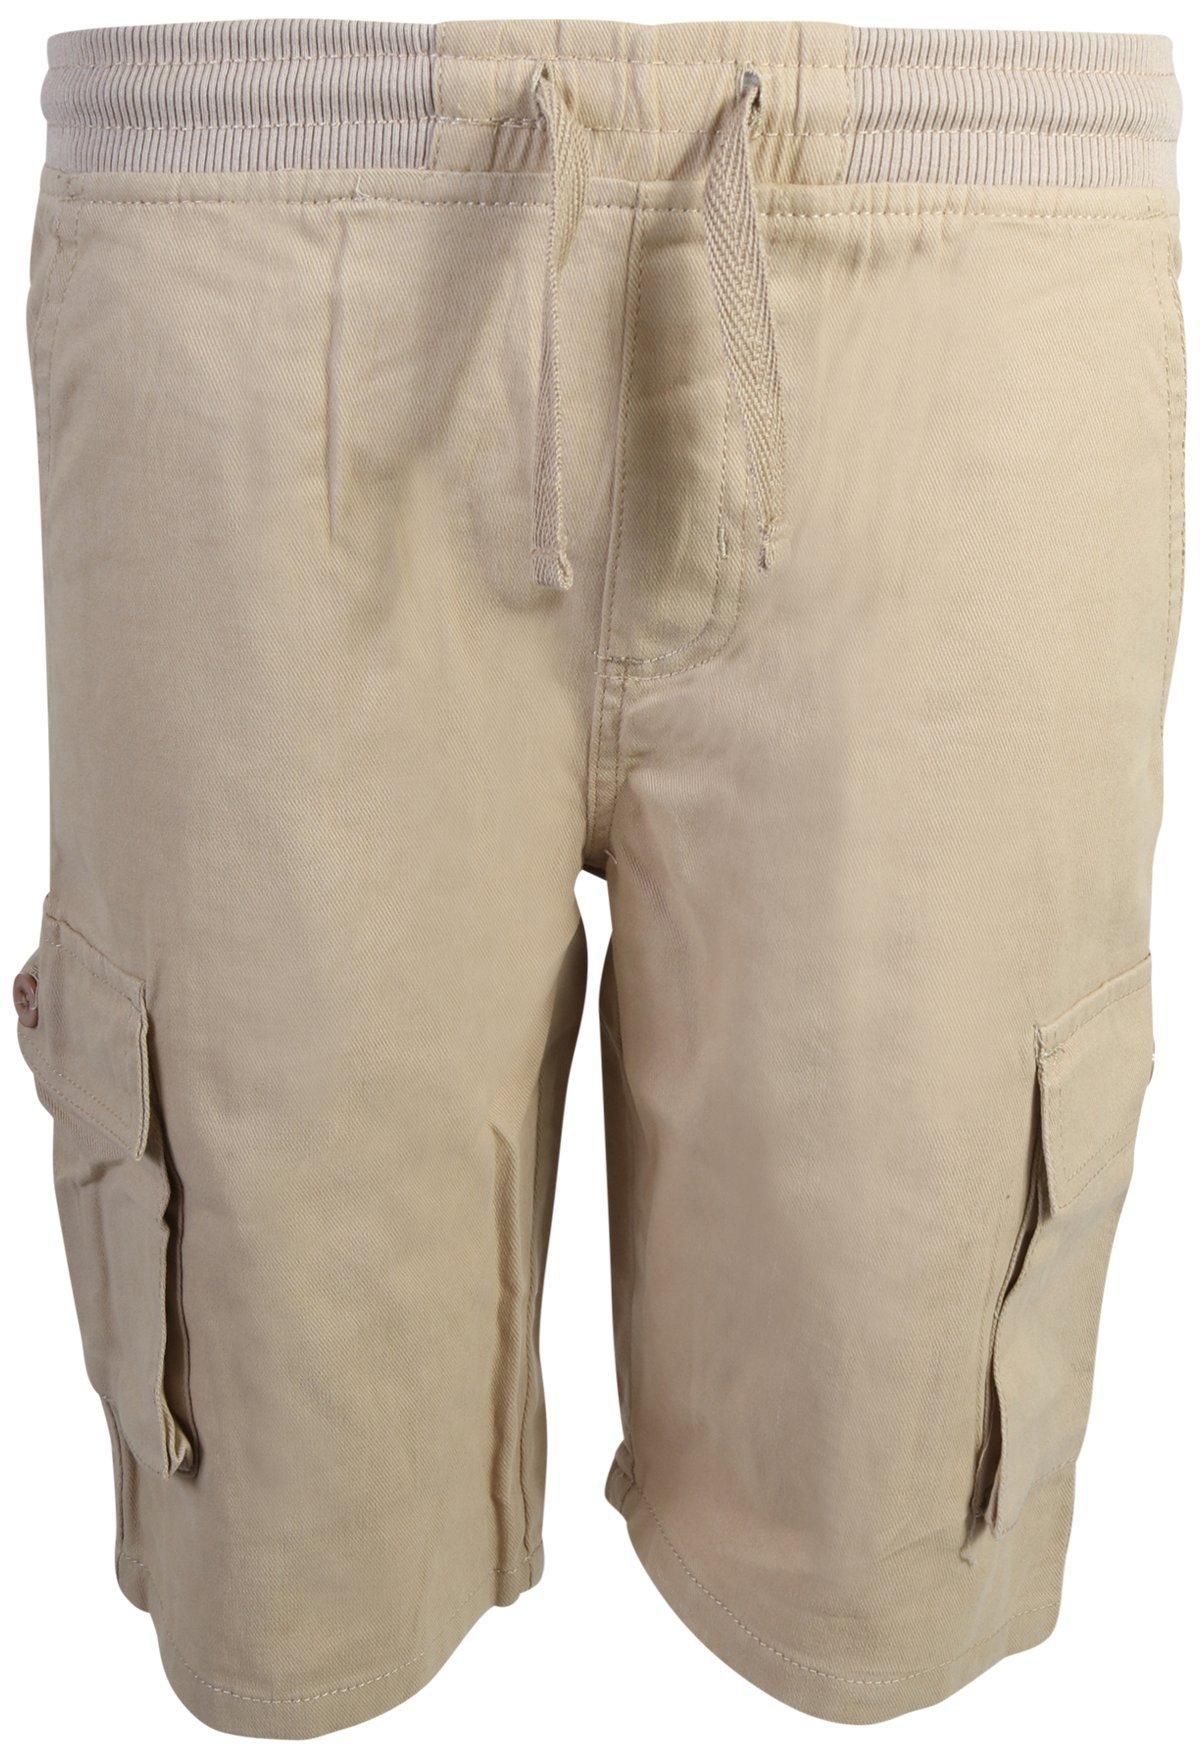 Quad Seven Boys Pull-On Twill Cargo Shorts, Khaki, Size 12'